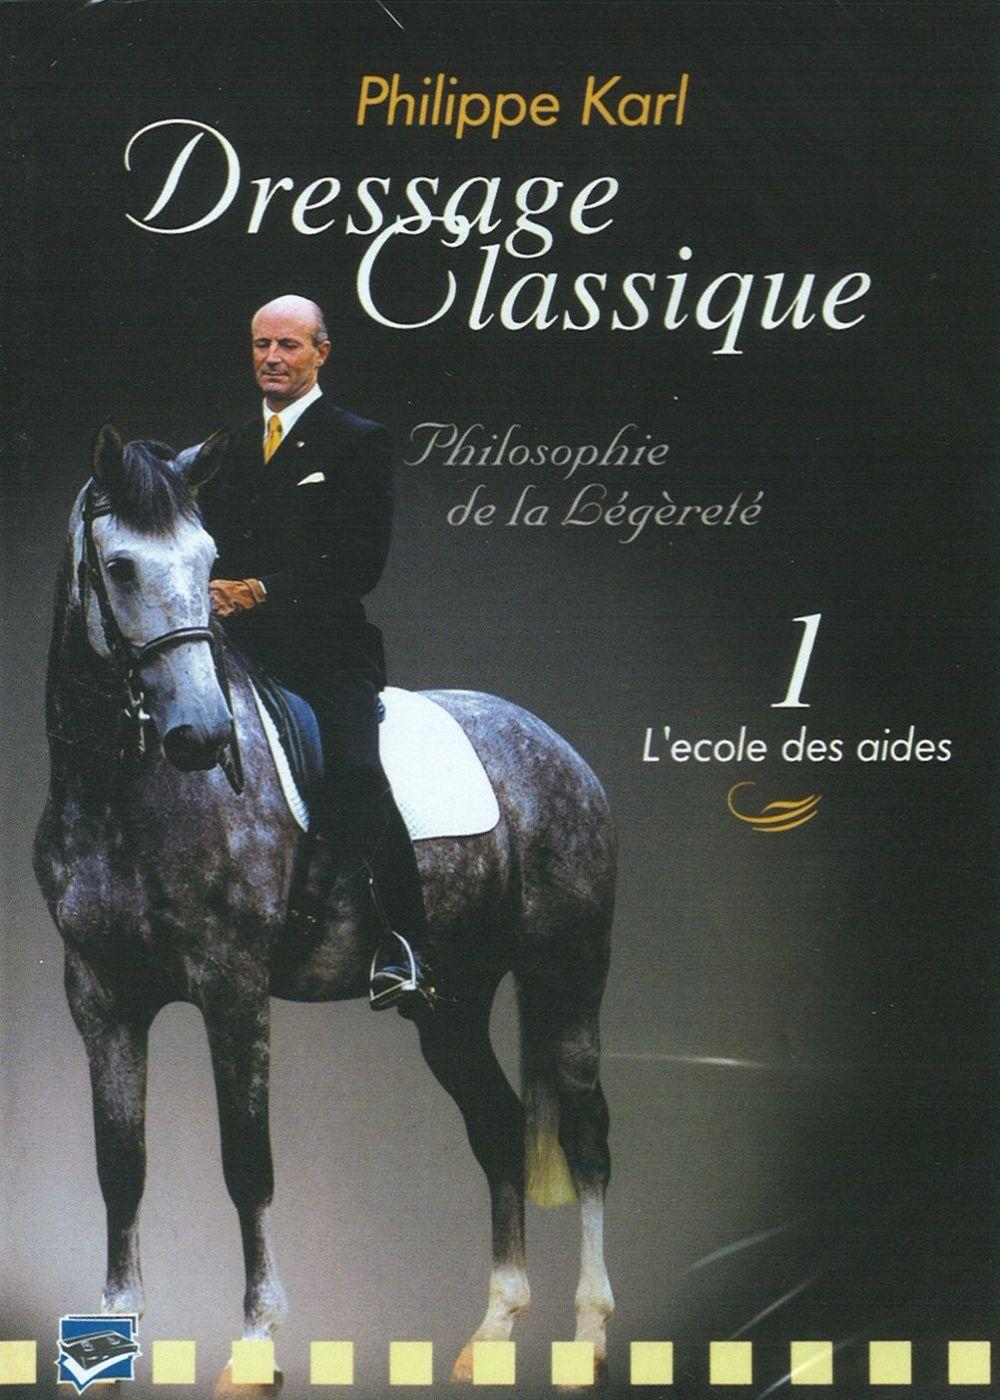 Achat DVD Dressage Classique : Philippe Karl - Vol 1